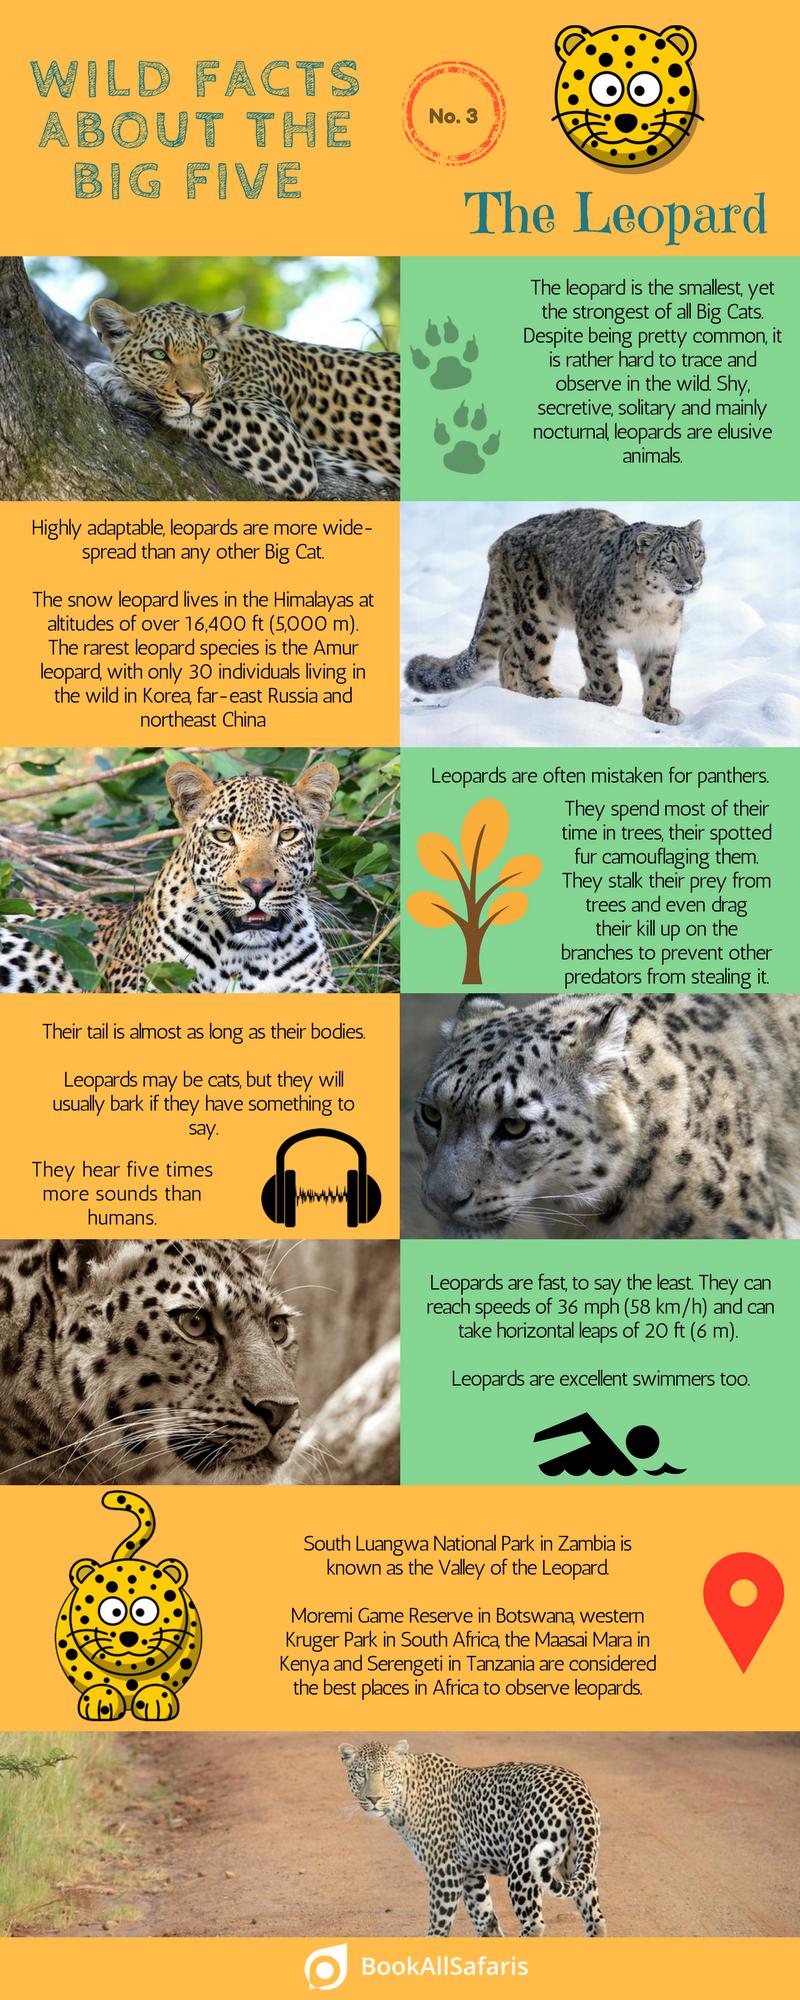 big-five-leopard-facts | The Big Five | Leopard facts